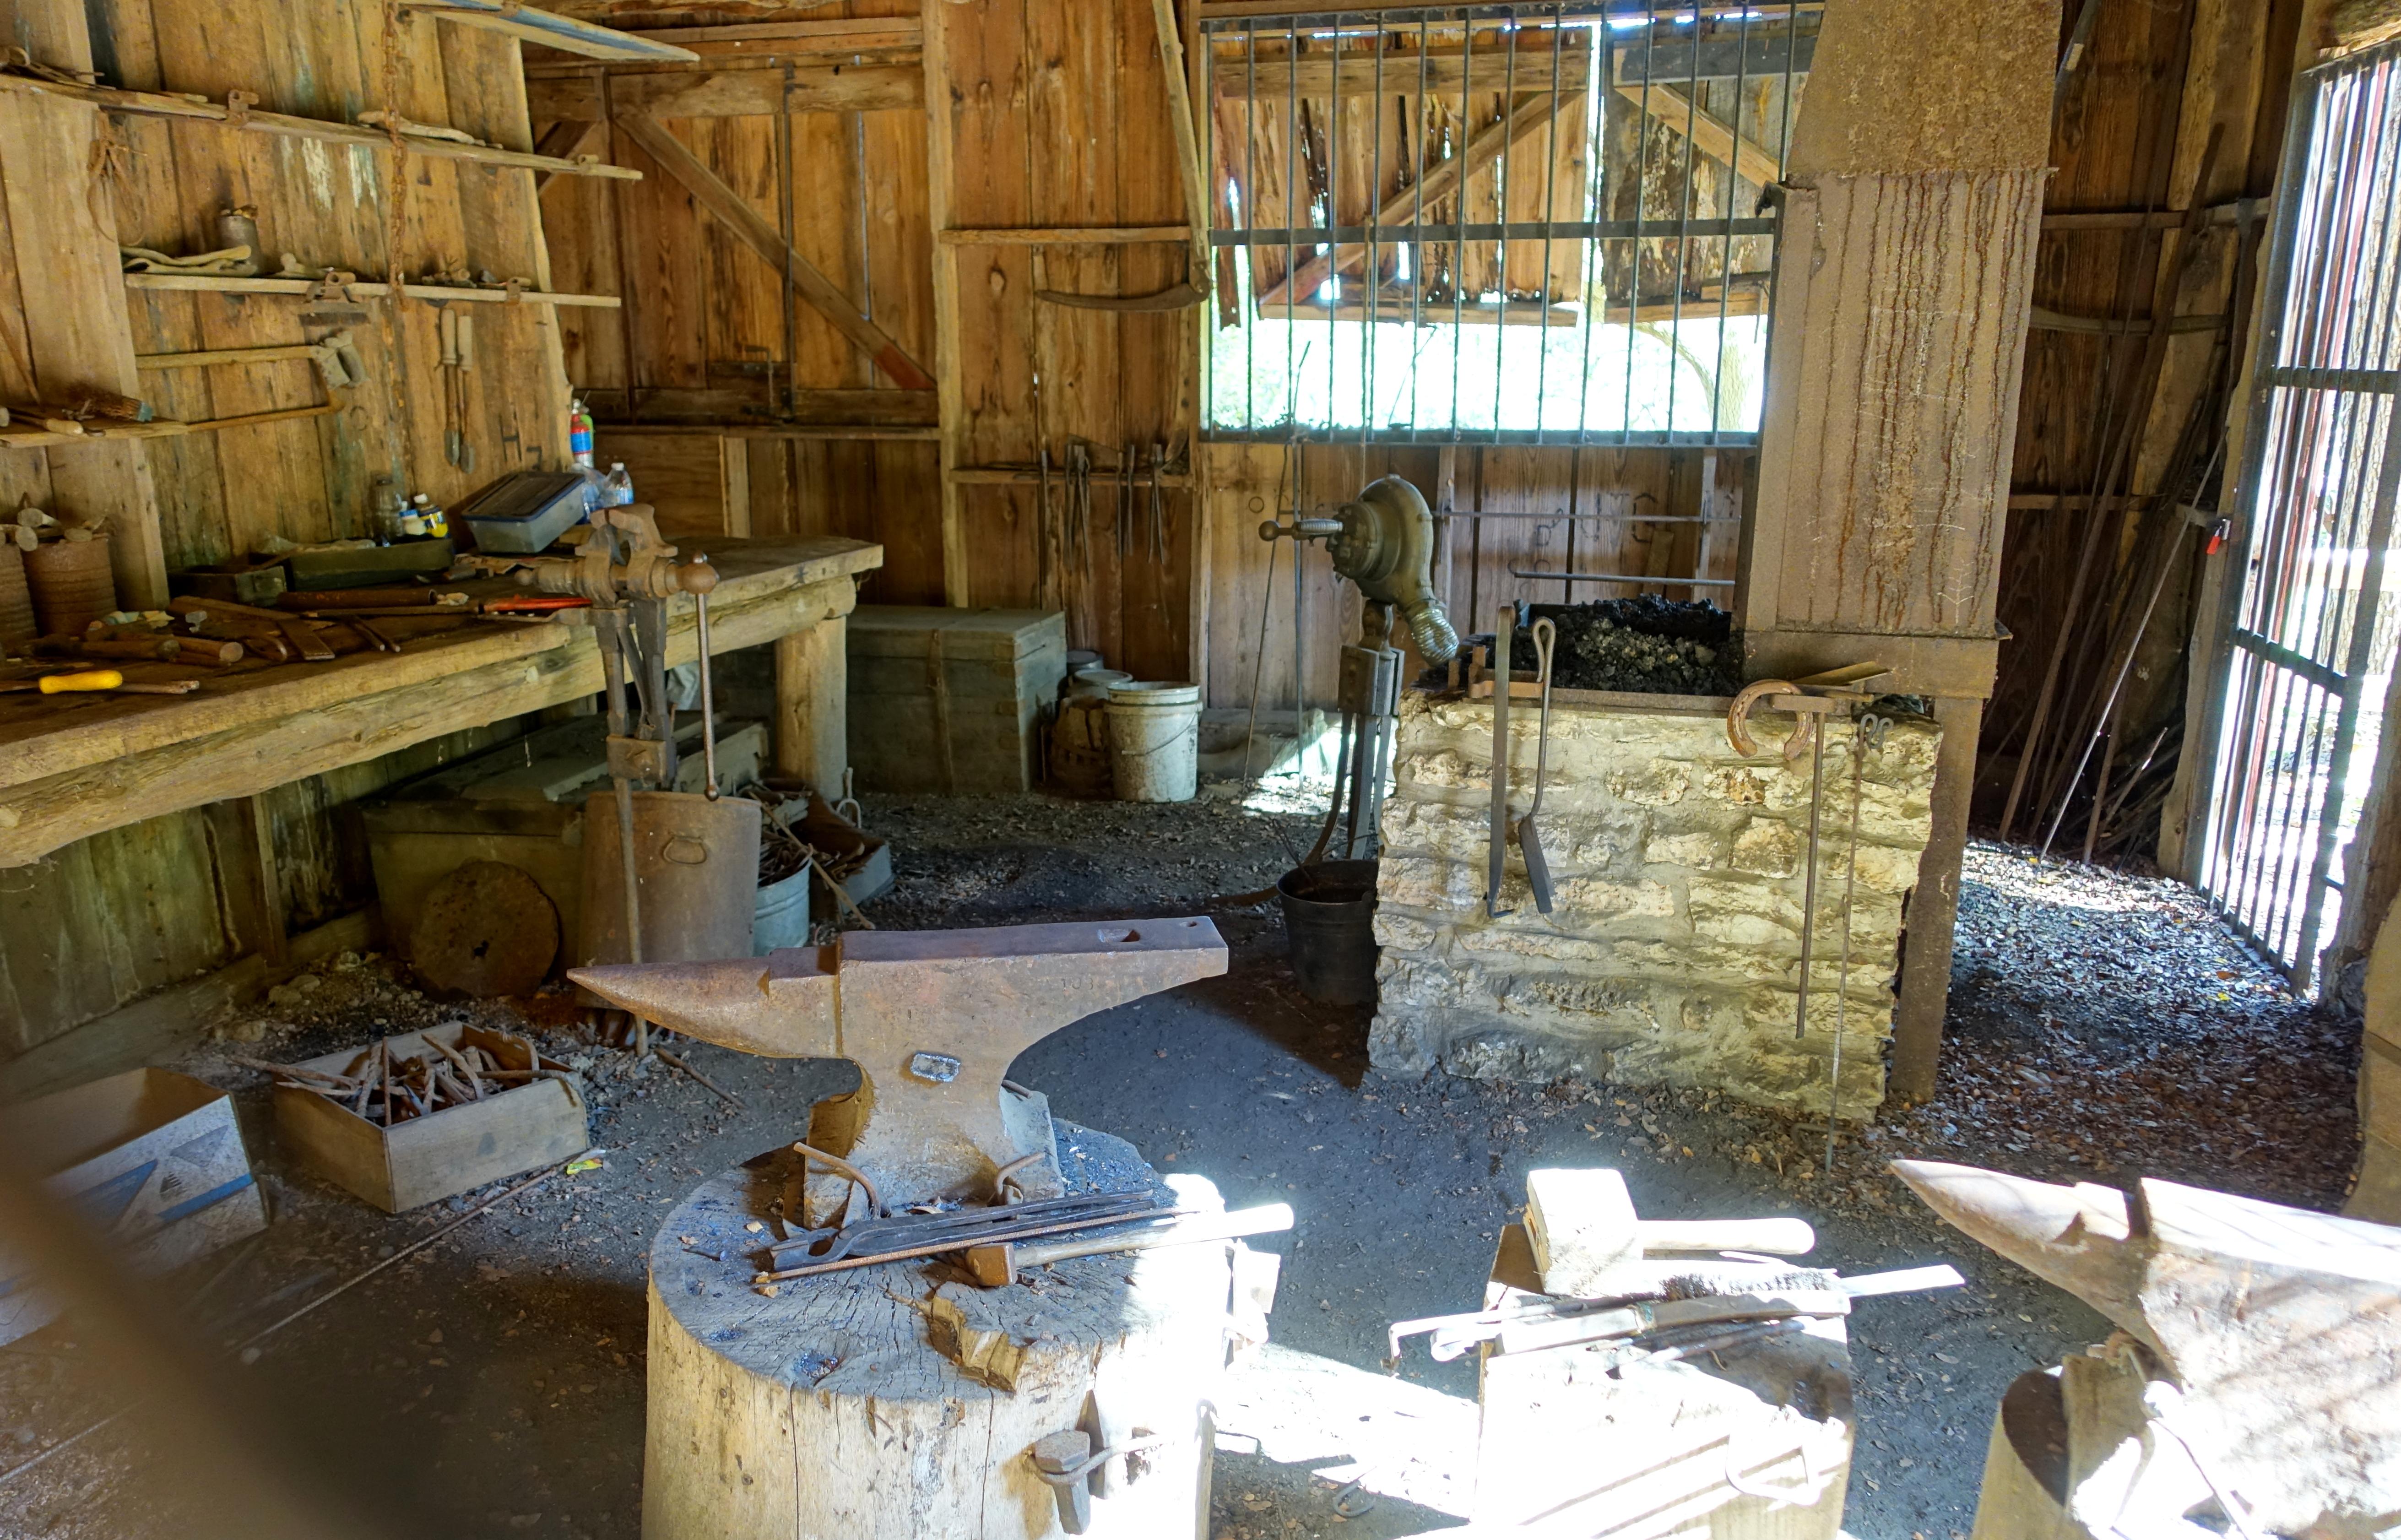 File:Interior - Swedish Blacksmith Shop - Zilker Botanical Garden ...